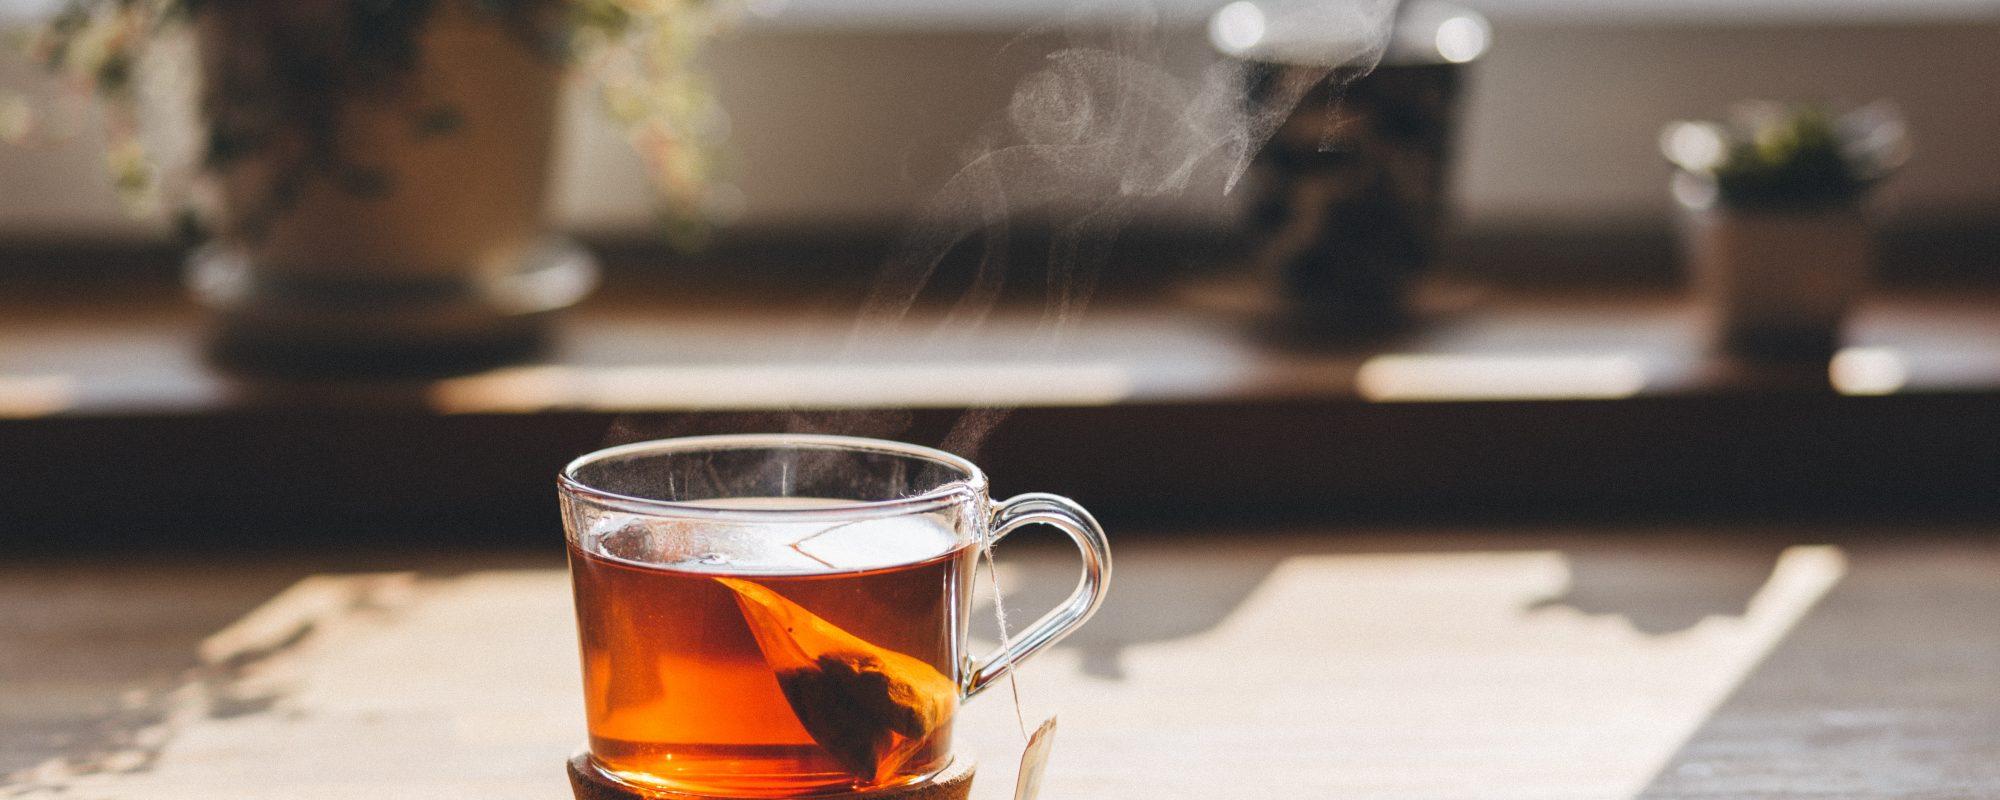 negative-space-cup-hot-tead-wood-table-joanna-malinowska